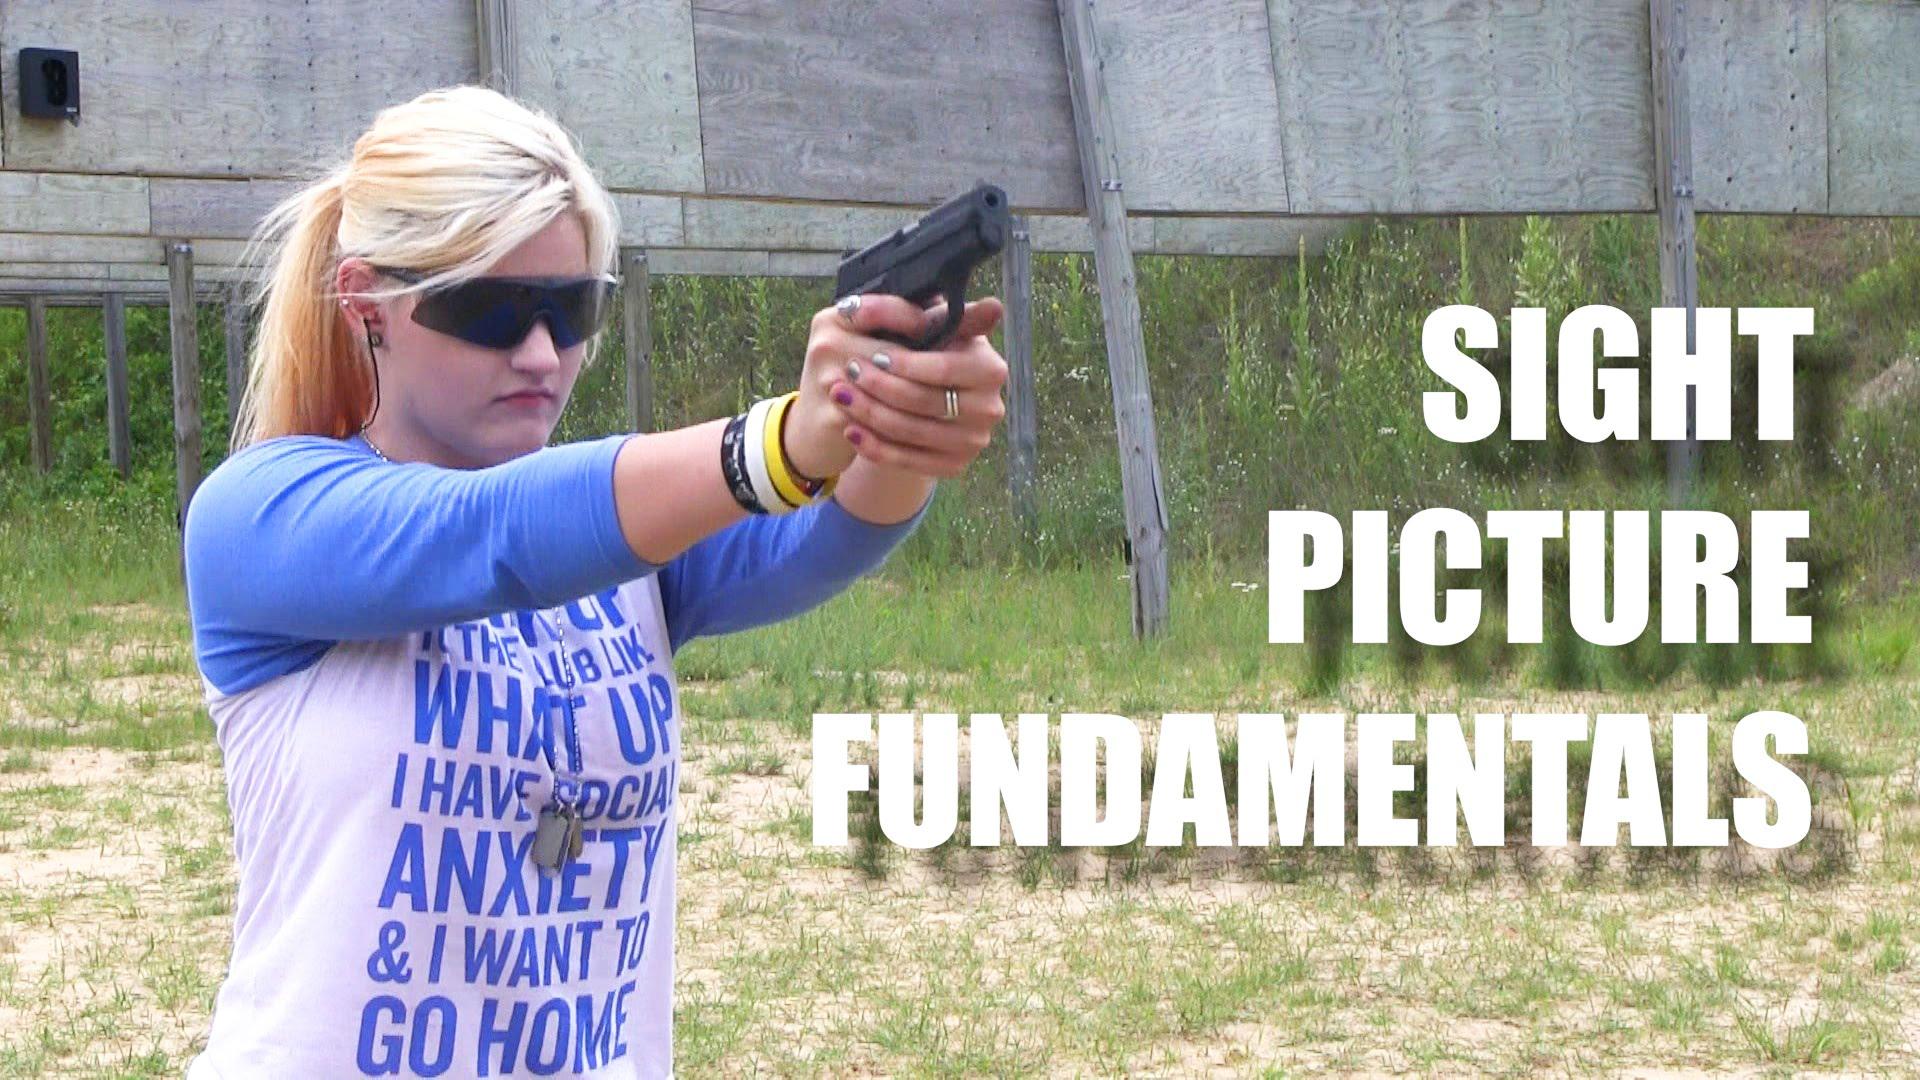 Sight Picture Fundamentals